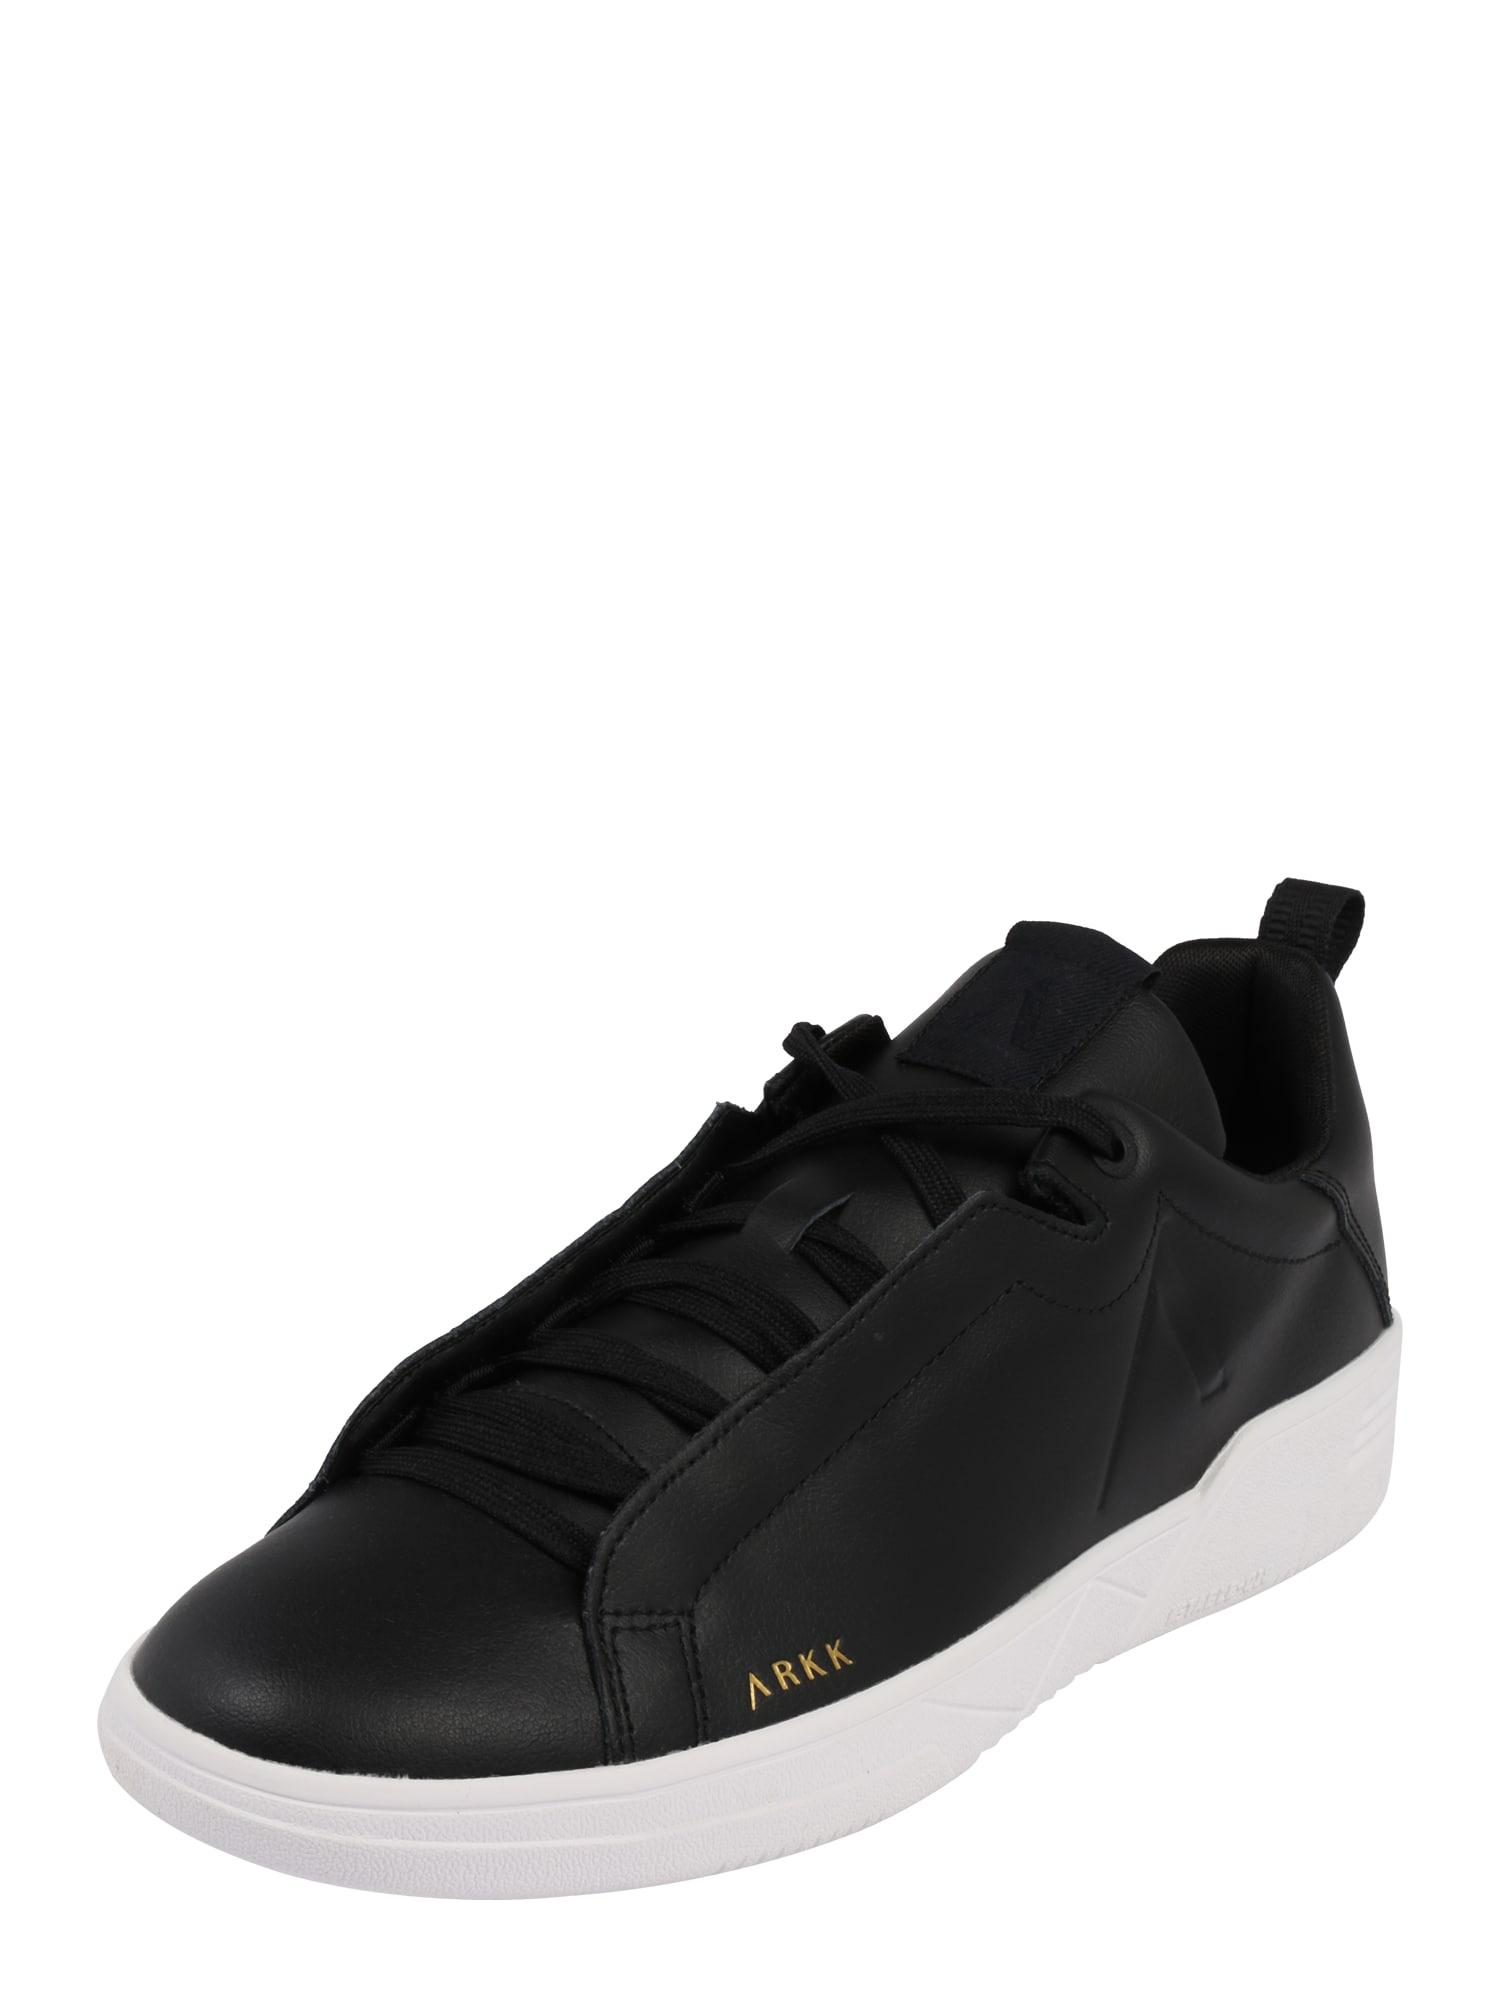 ARKK Copenhagen Nízke tenisky 'Uniklass Leather S-C18'  biela / čierna